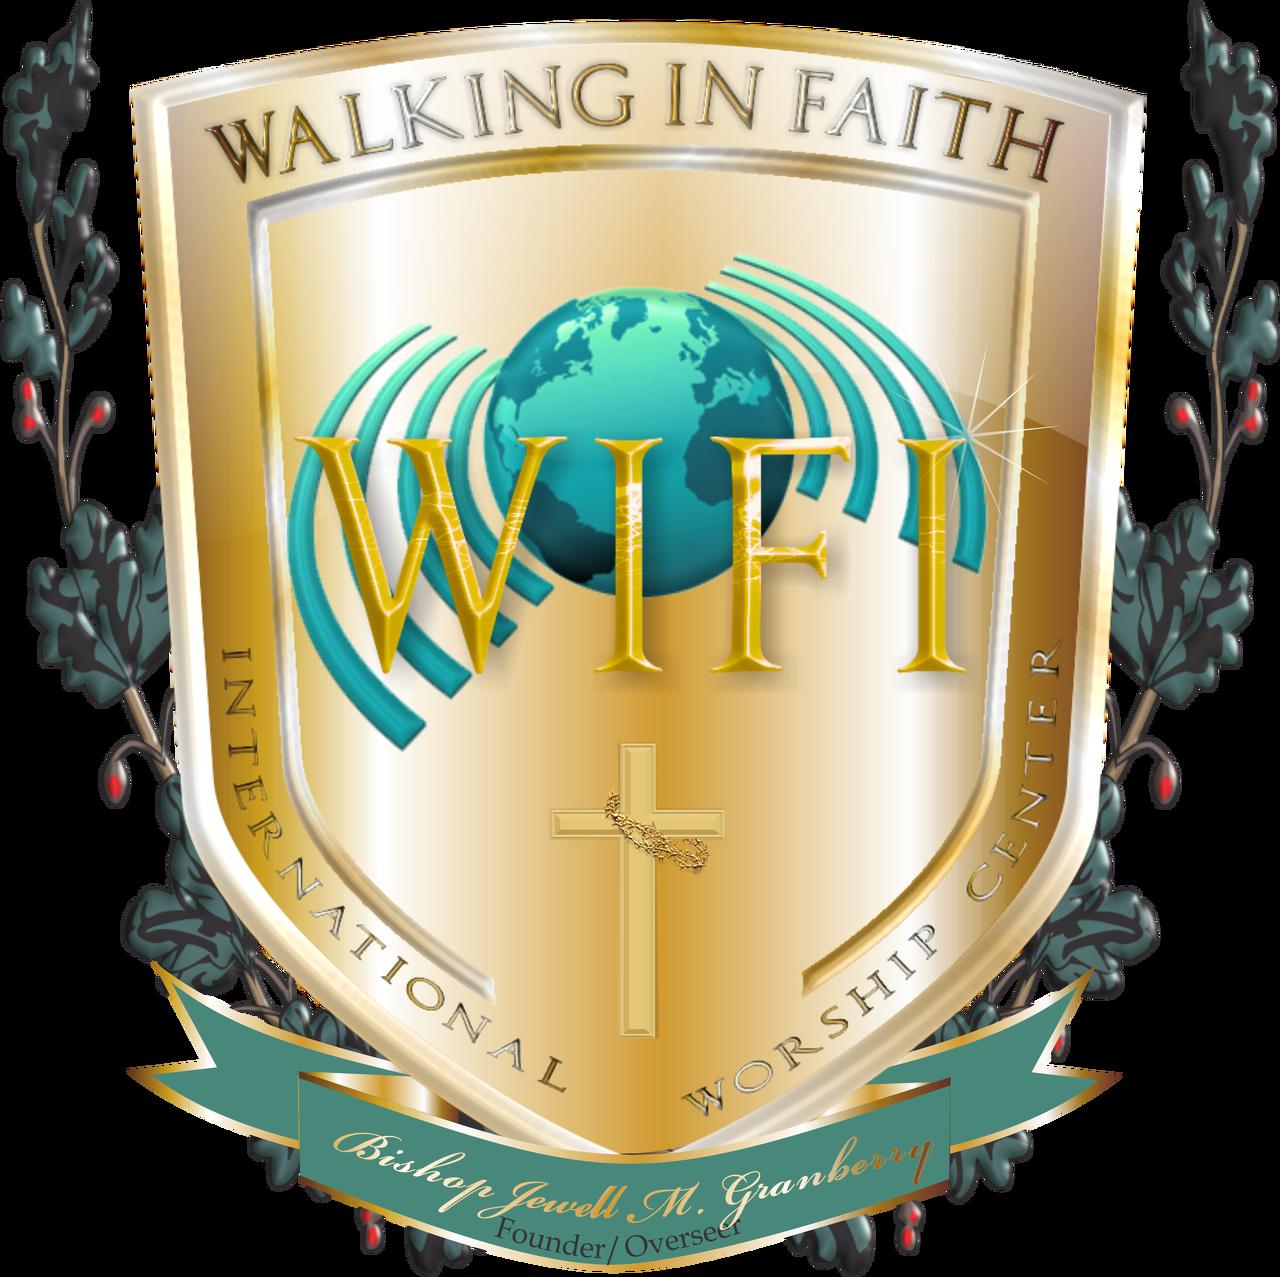 Walking in international worship. Faith clipart walk by faith